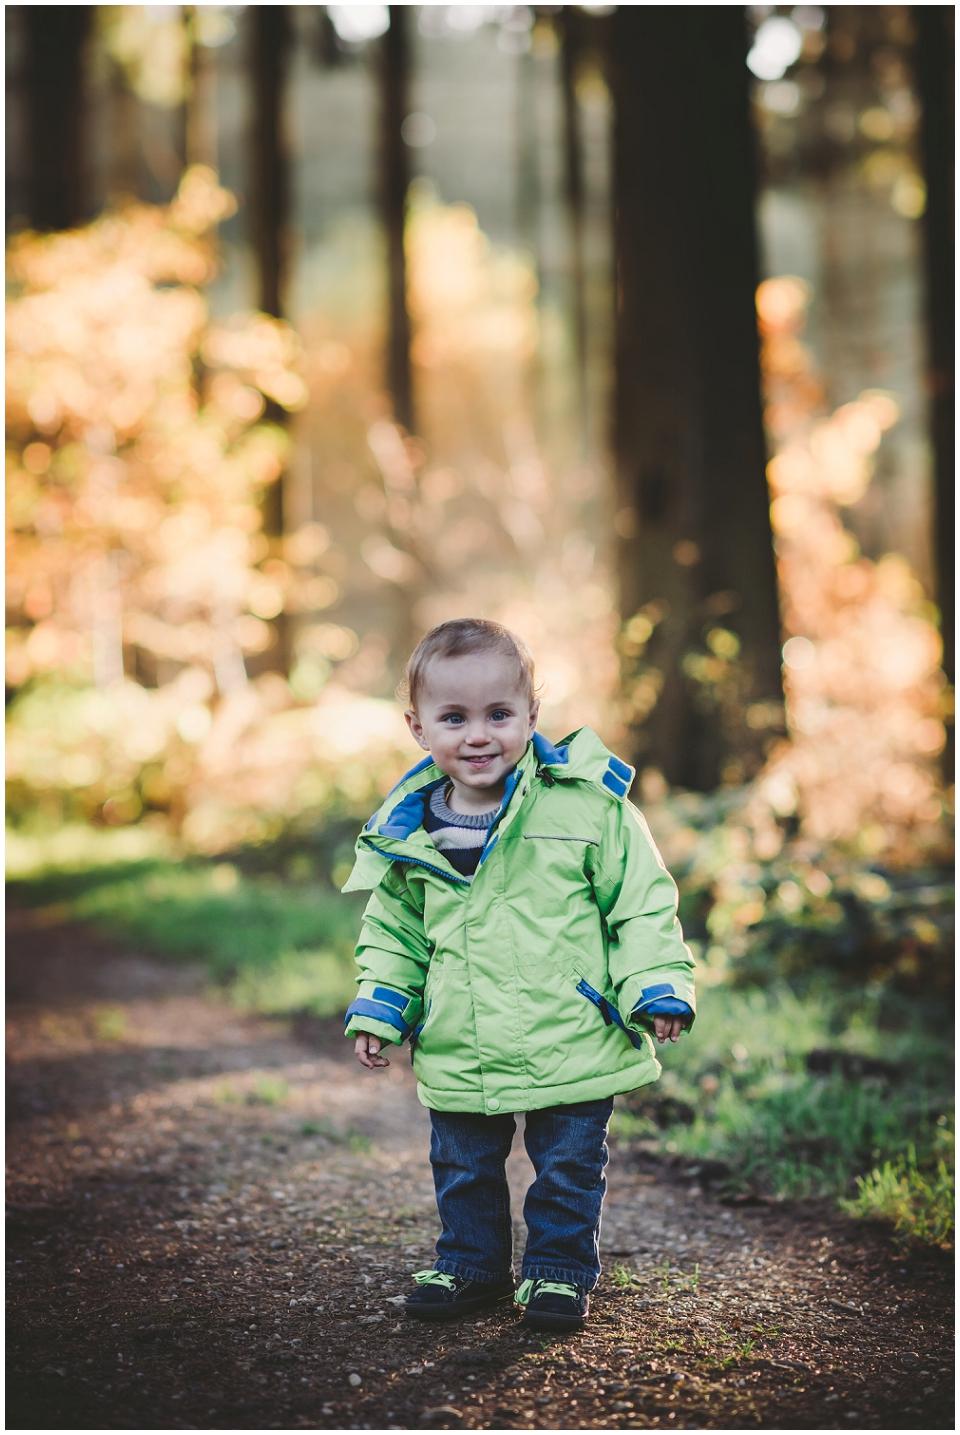 Herbst, Kind, kleiner Mann, Wald, Dreiländerpunkt, Aachen, Vaals, Astrid Ebert Fotografie